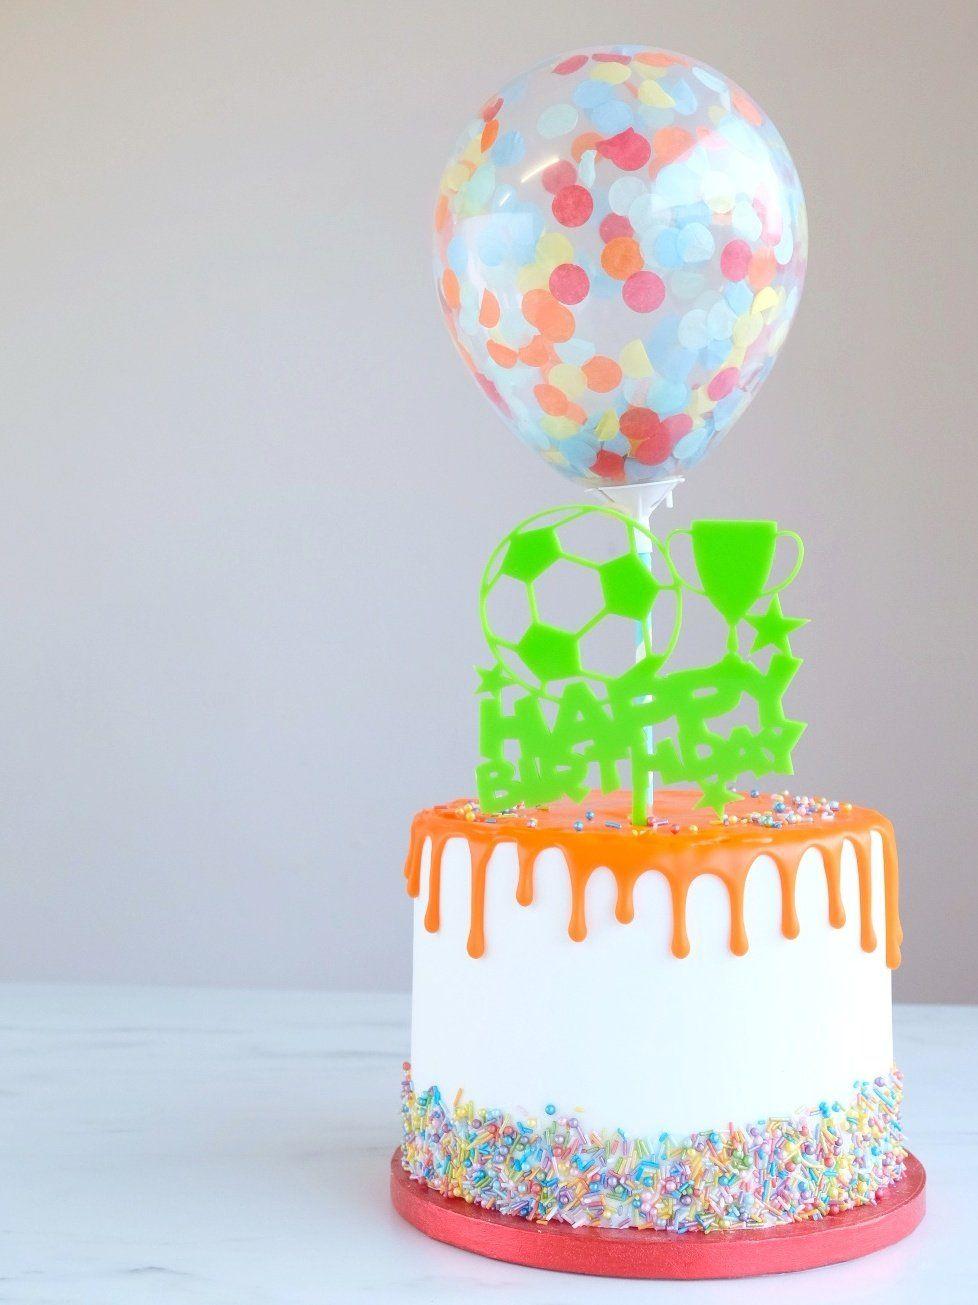 Confetti Cake Balloon Pack of 2 - Festival